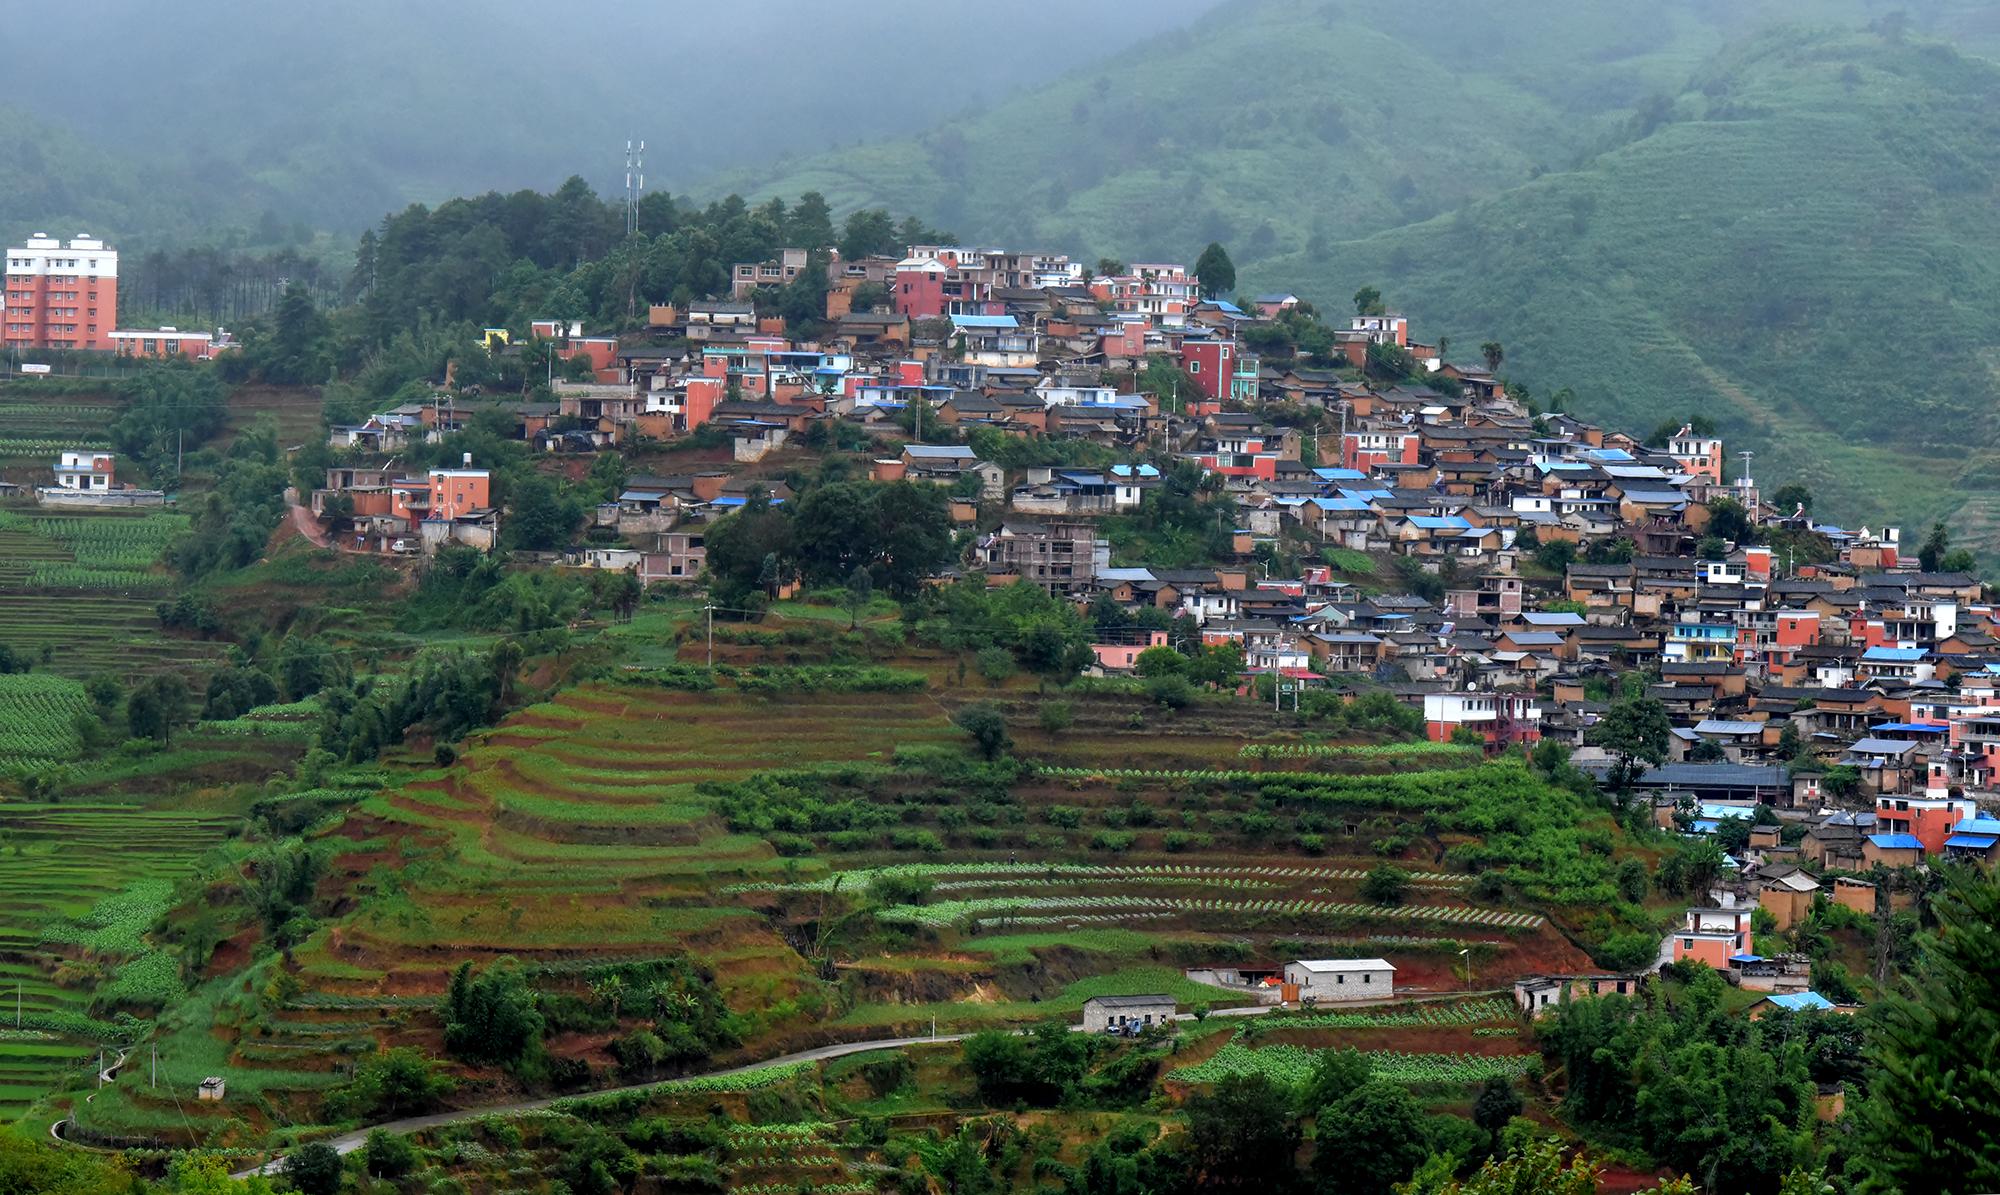 Rural village, Yunnan province